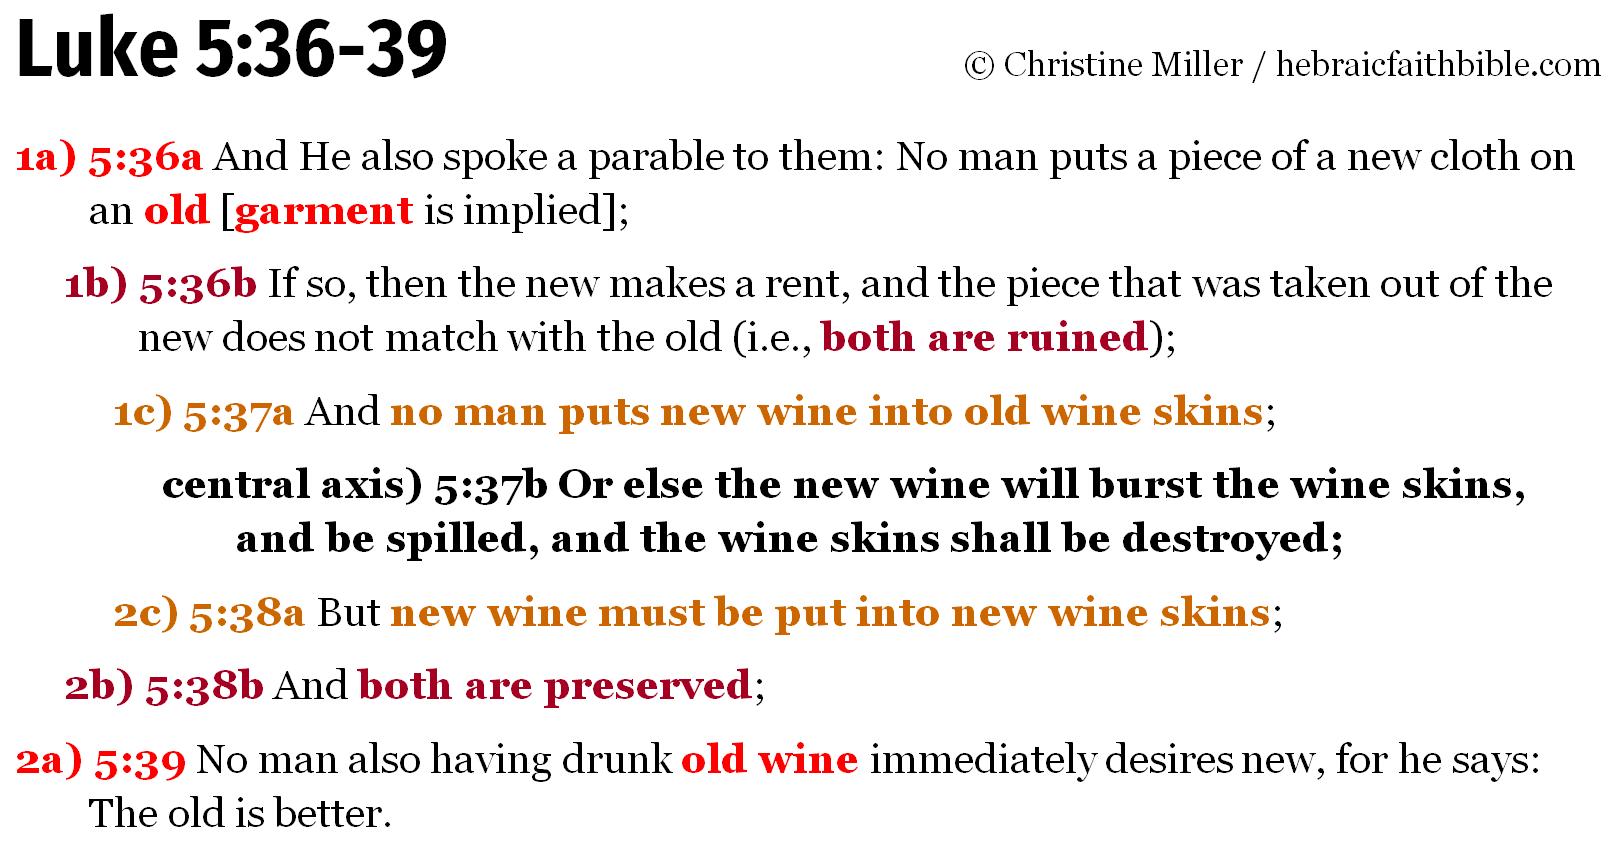 Luk 5:36-39 chiasm | hebraicfaithbible.com